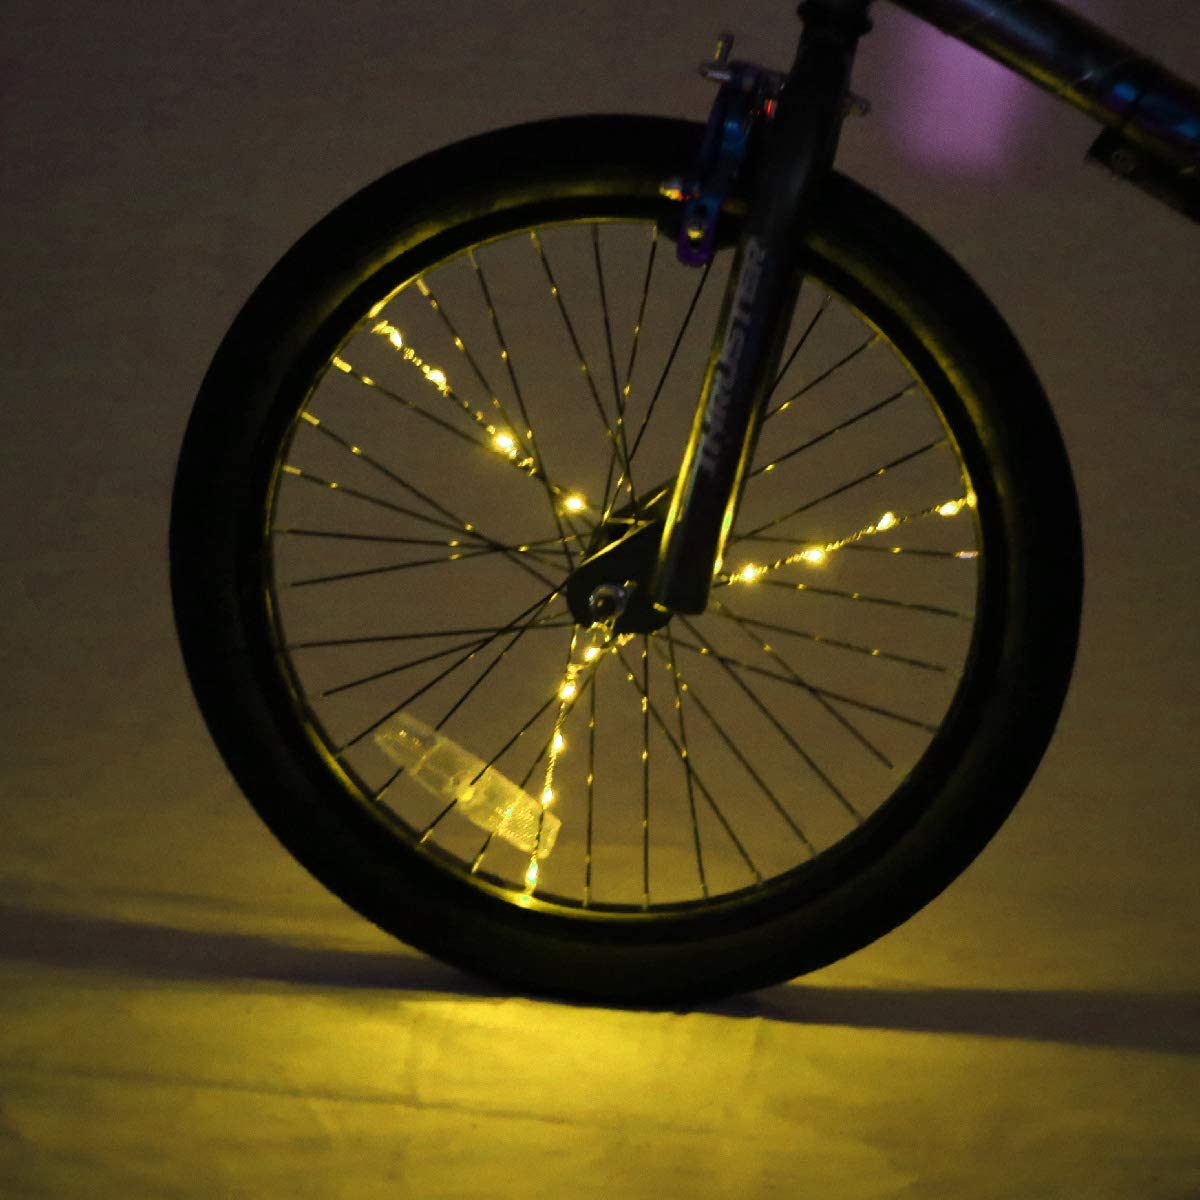 for 1 Wheel Gold Brightz SpokeBrightz LED Bicycle Spoke Accessory Light